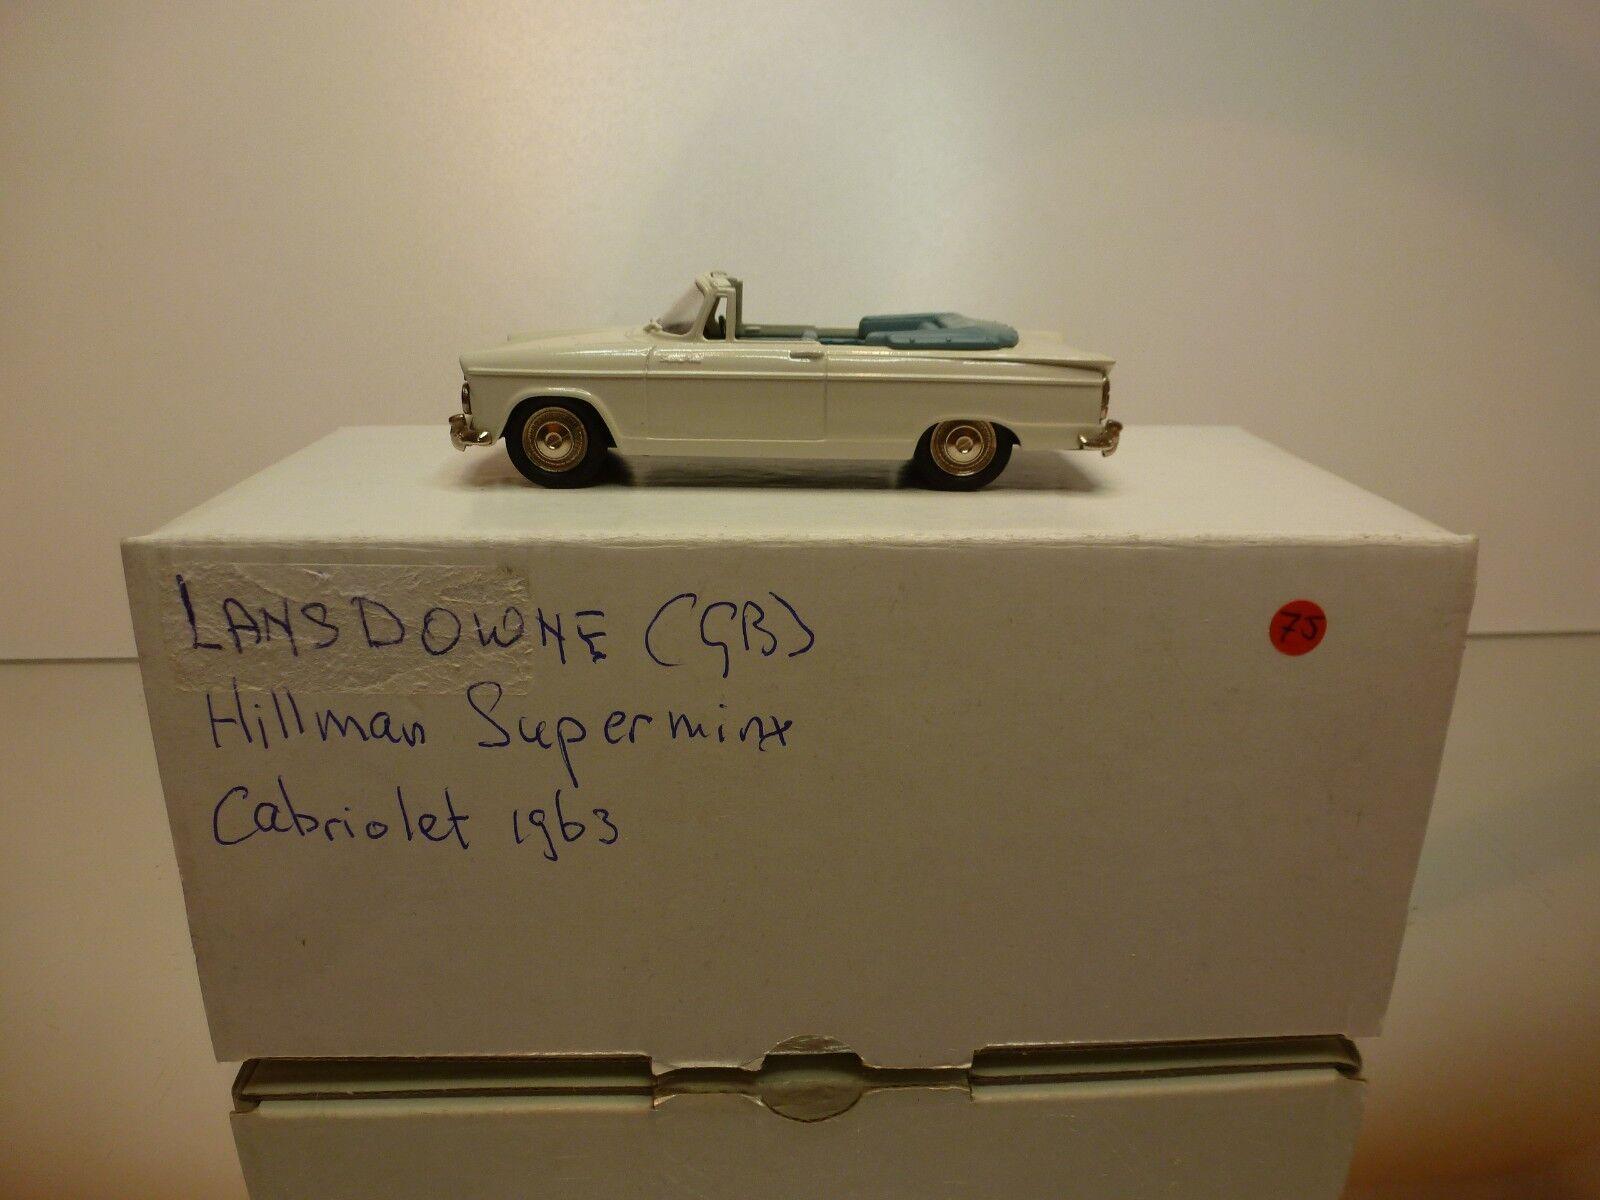 LANSDOWNE 13 HILLMAN SUPERMINX CONgreenIBLE 1963 - WHITE 1 43 - EXCELLENT IN BOX